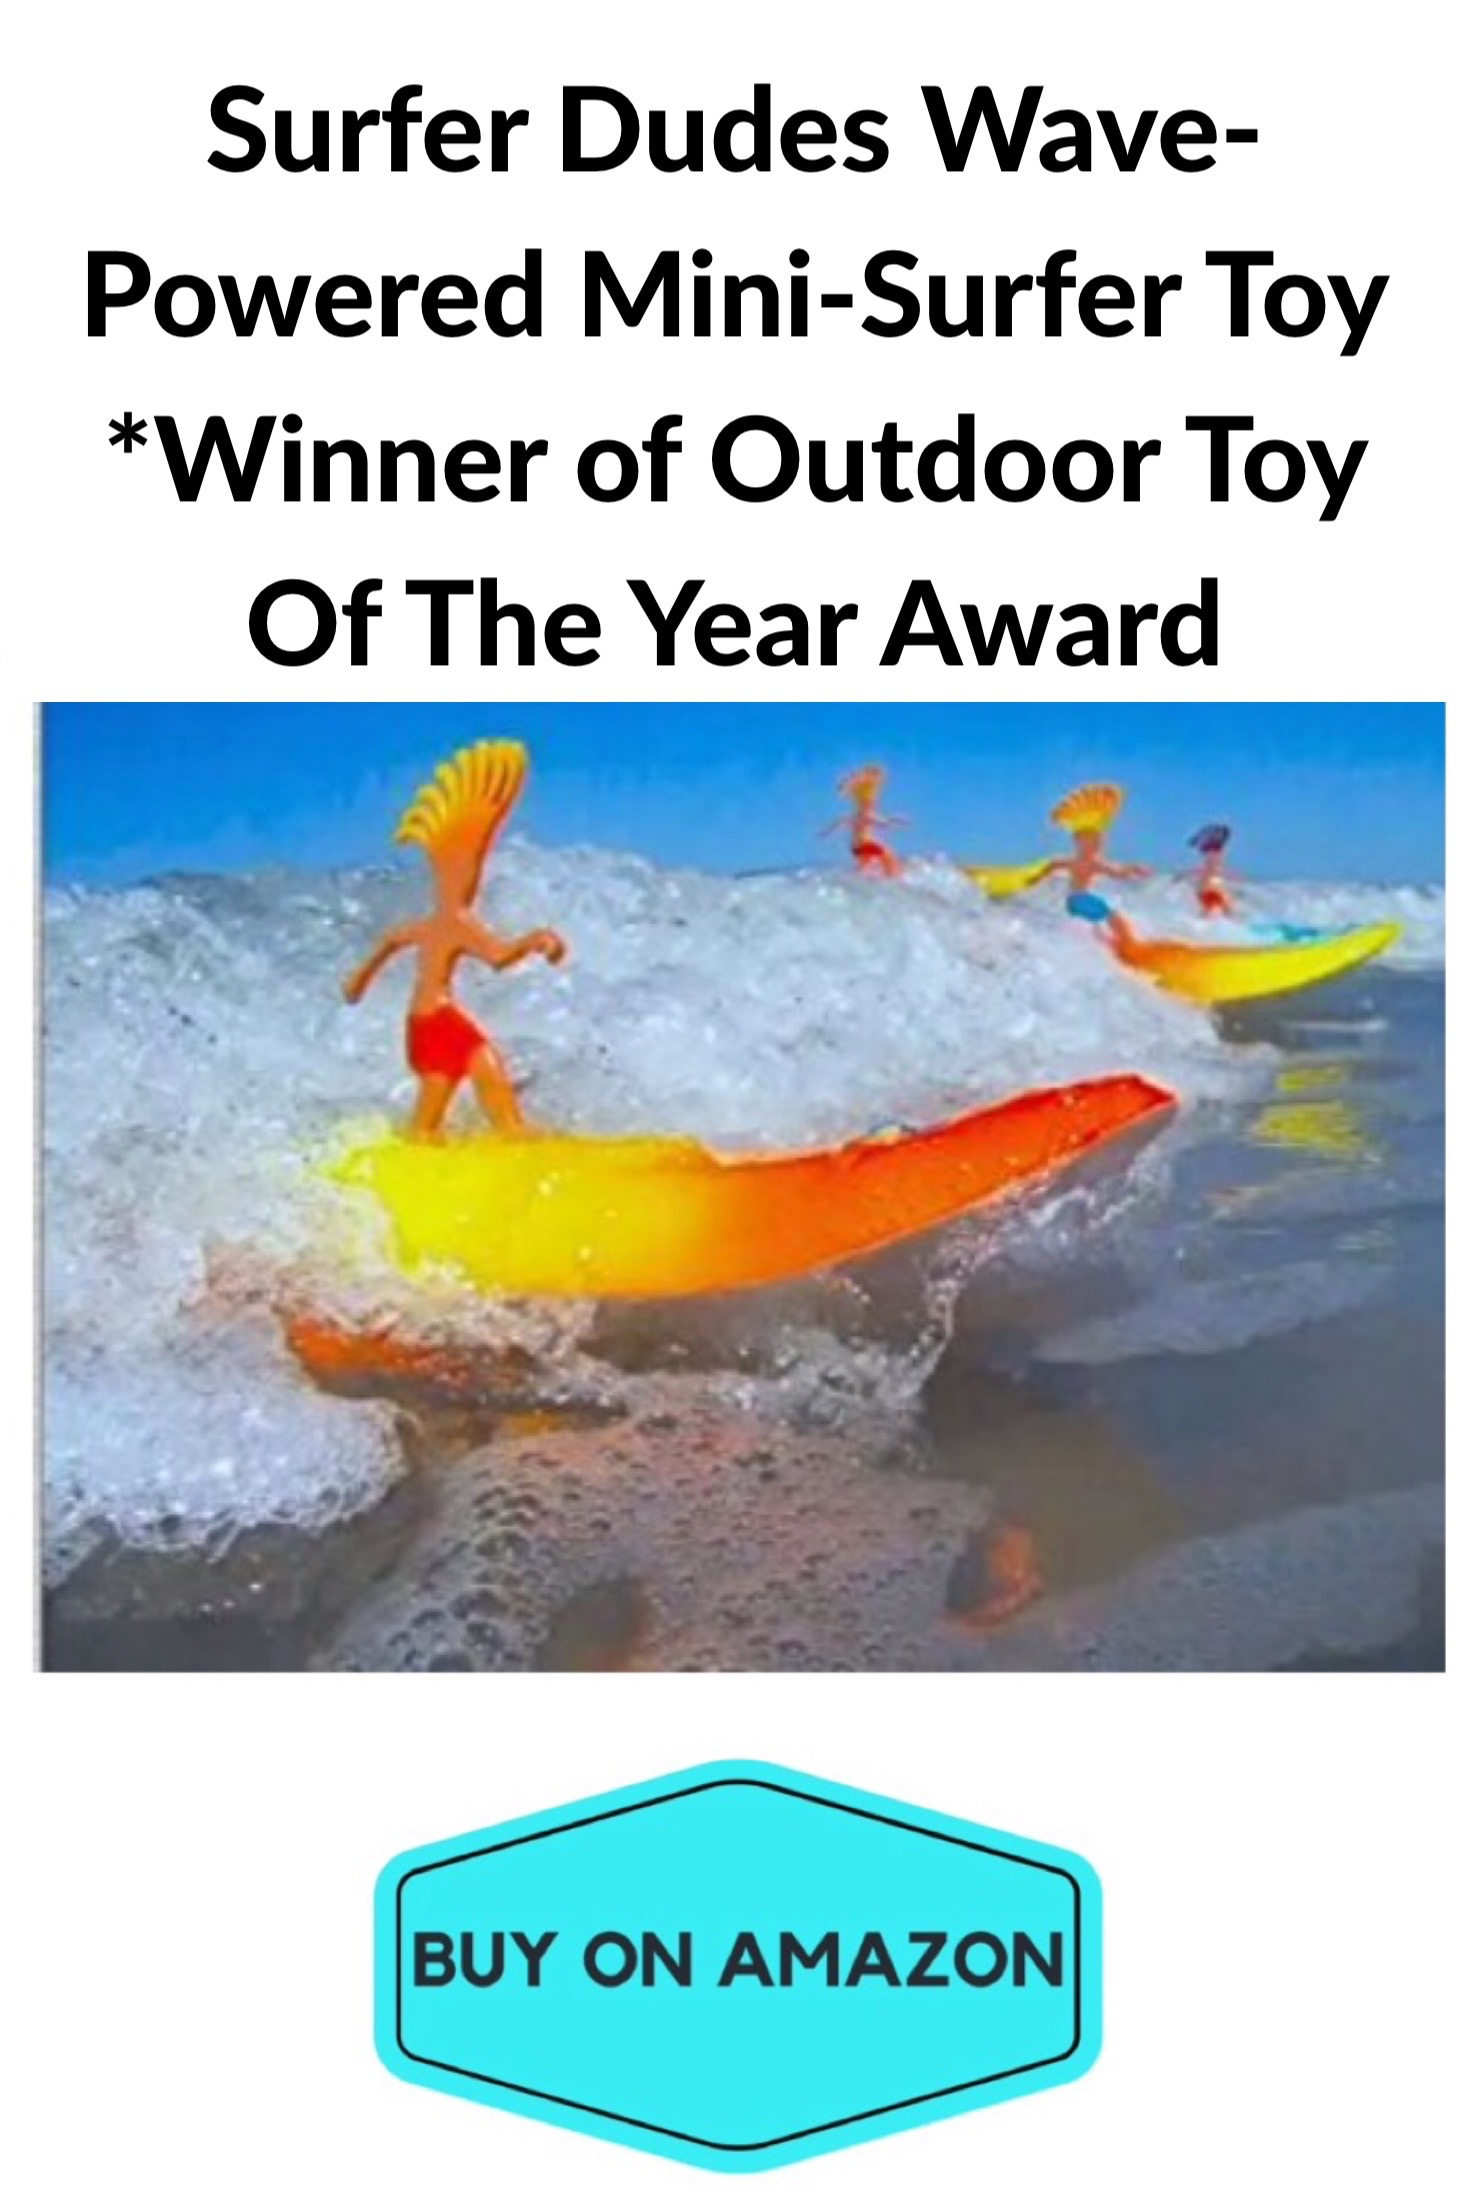 Surfer Dudes Wave-Powered Mini Surfer Toy